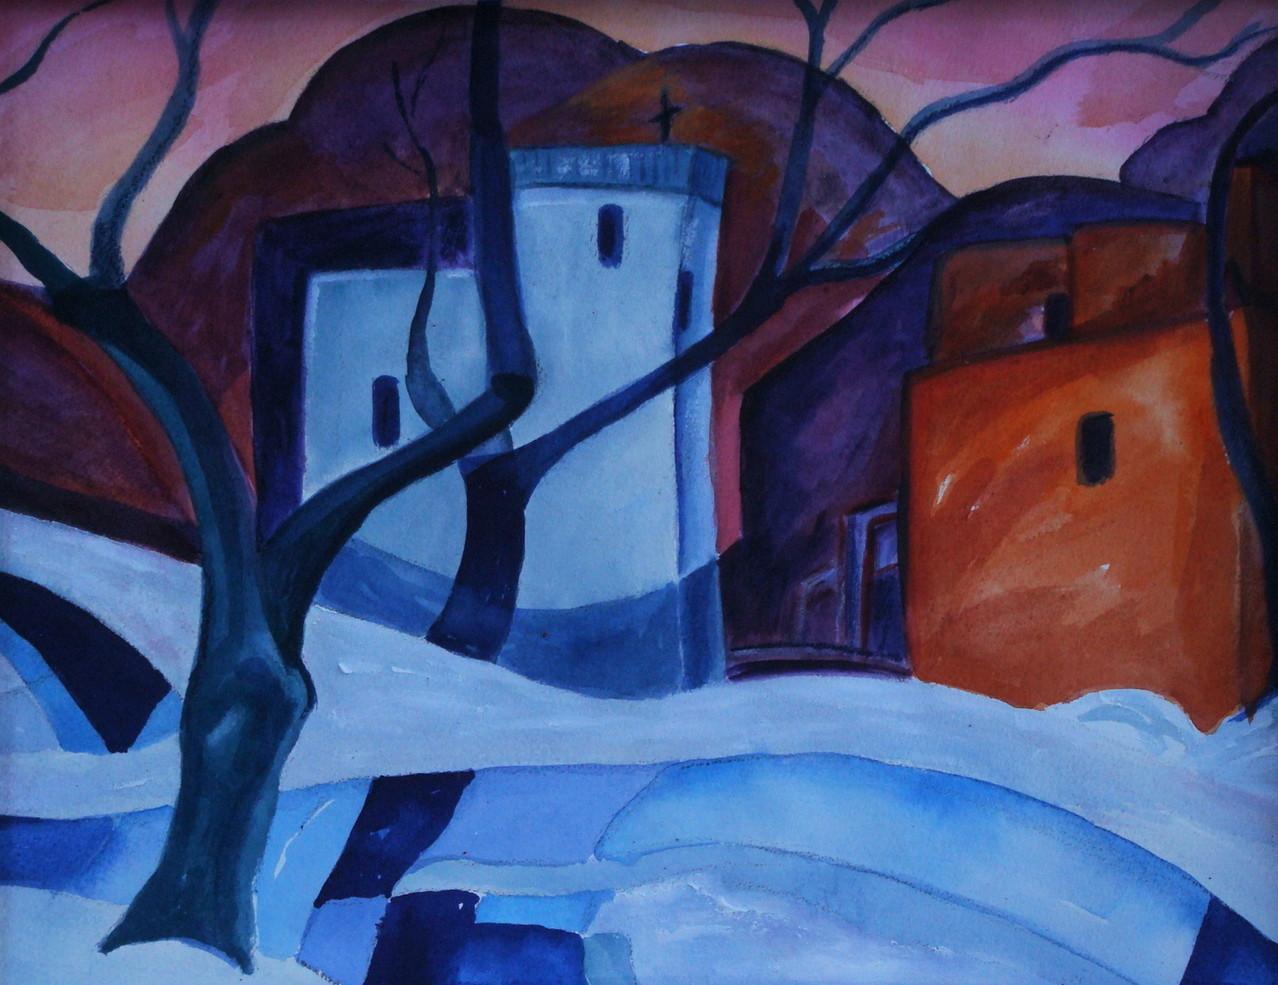 Winter's Glow, watercolor, 15.5 x 11.5, 2014, SOLD